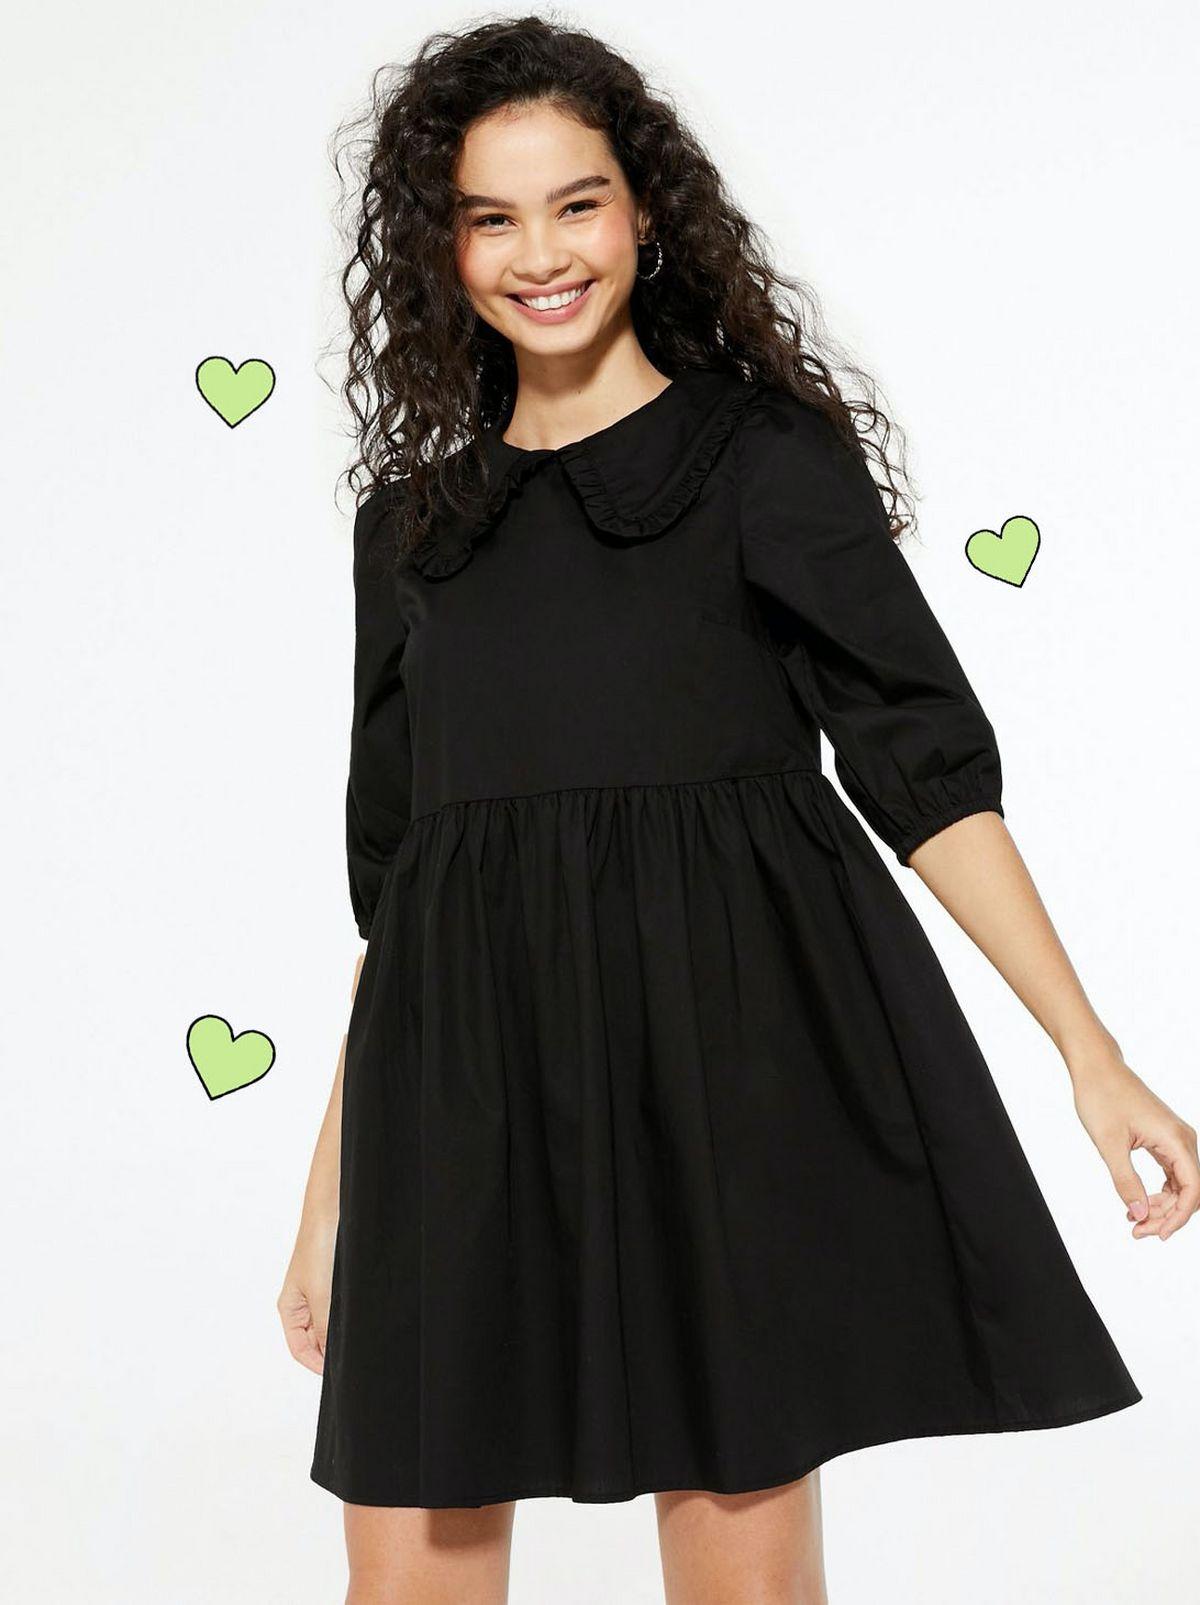 Woman Wearing a Black Frill Collar Smock Dress.